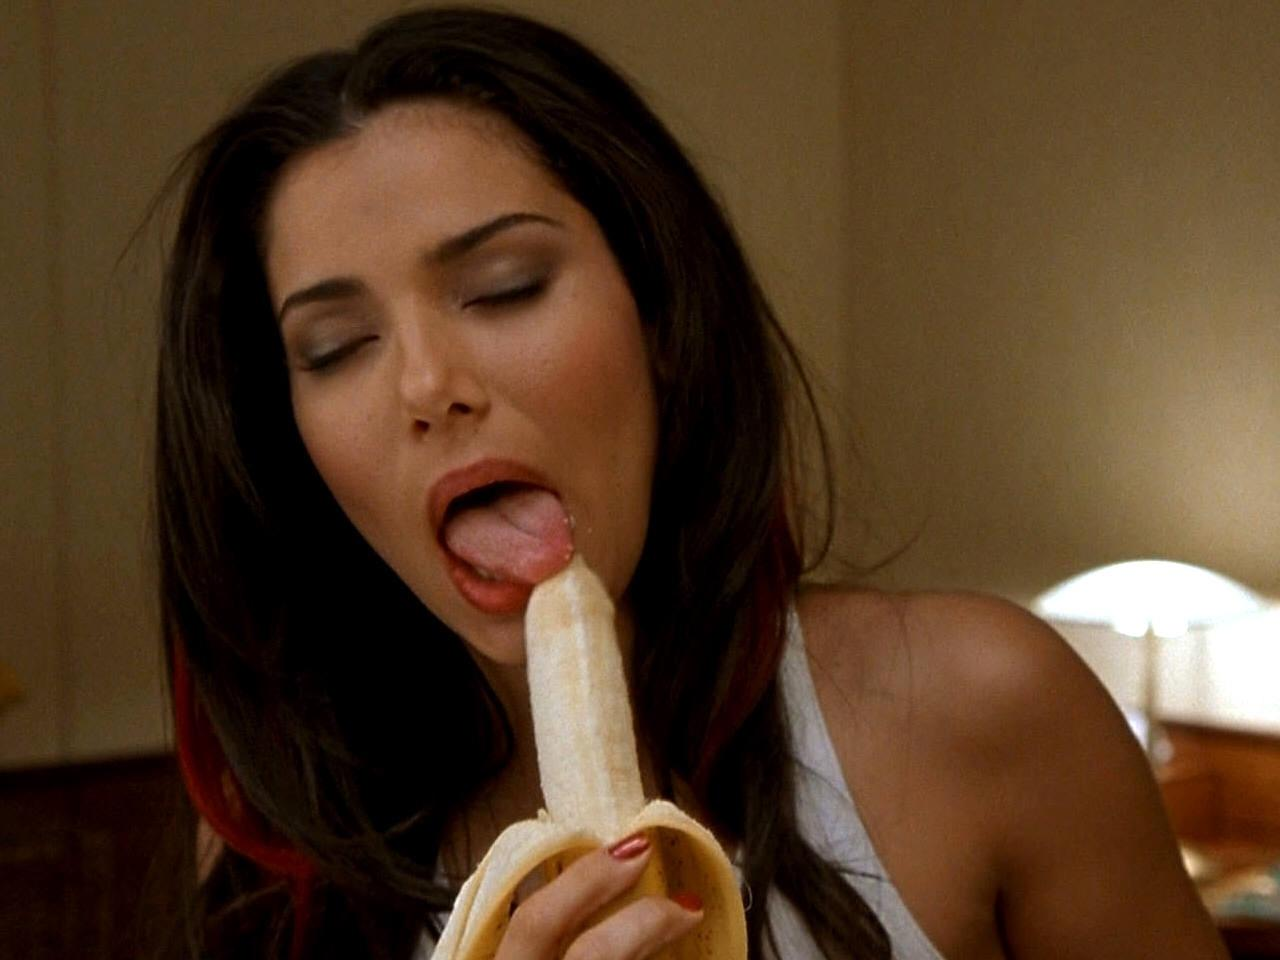 hot girls porn porn rakel liekki